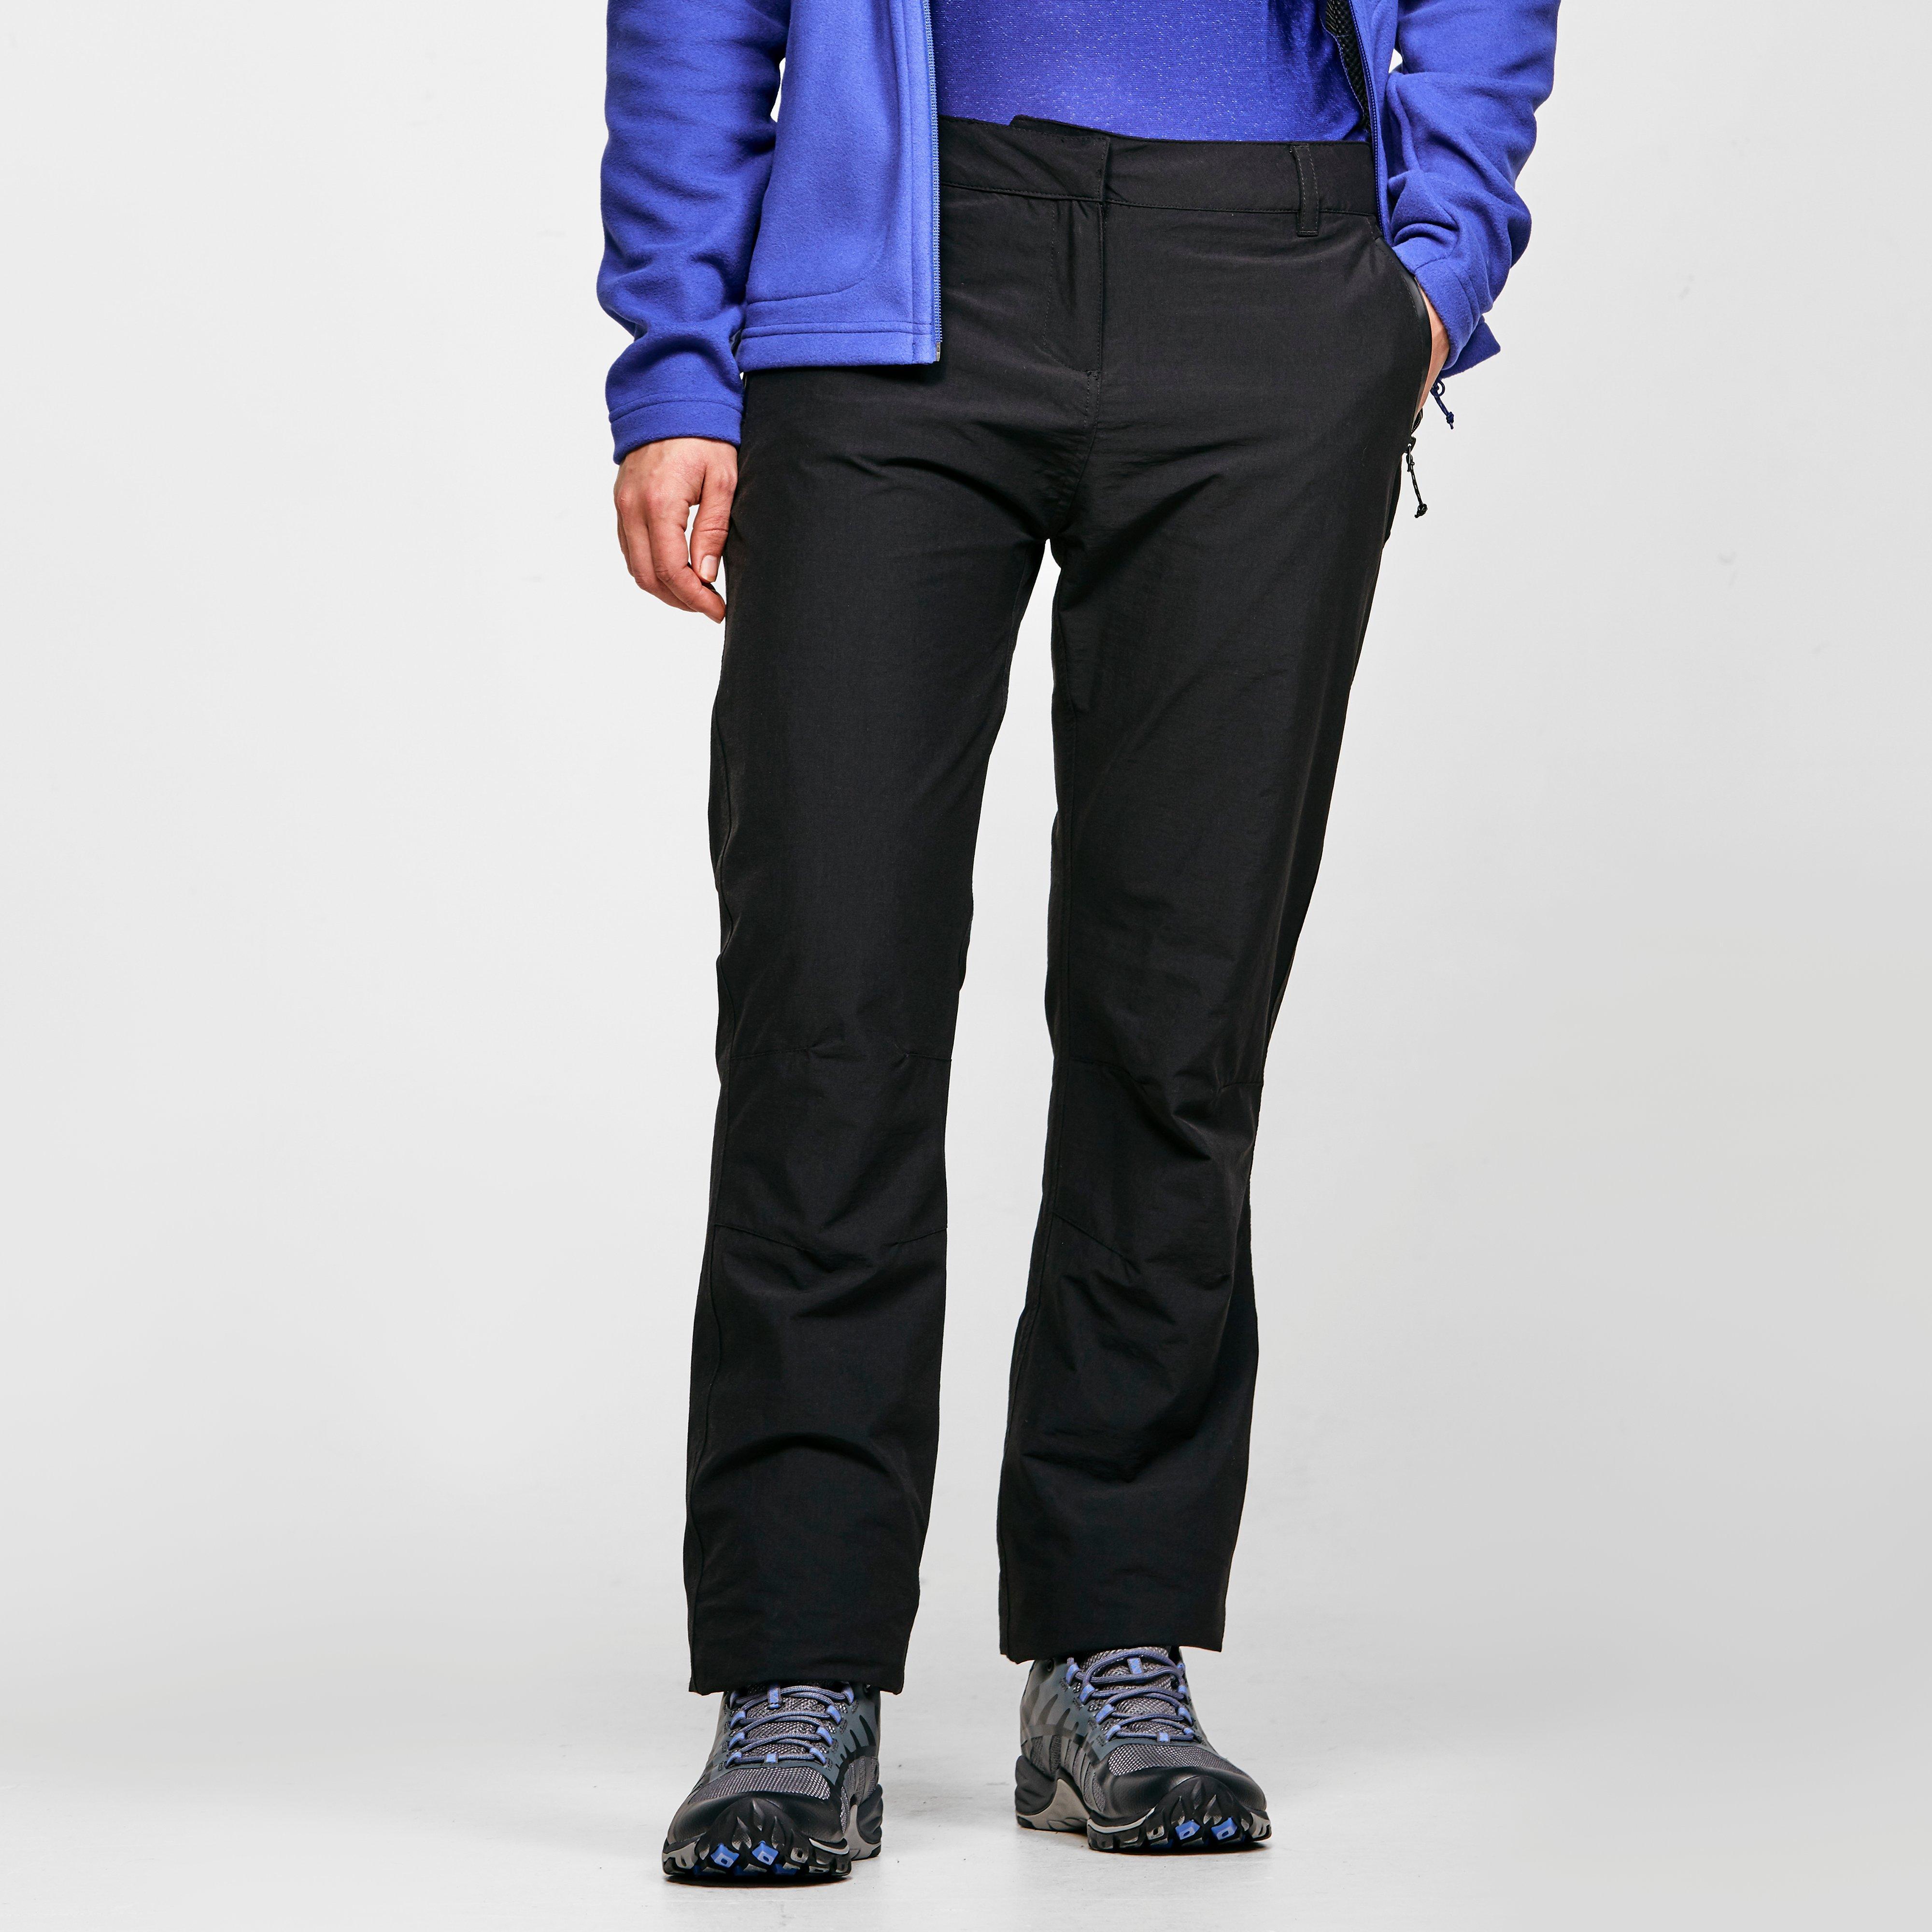 Craghoppers Craghoppers womens Kiwi Pro Waterproof Trousers - Black, Black